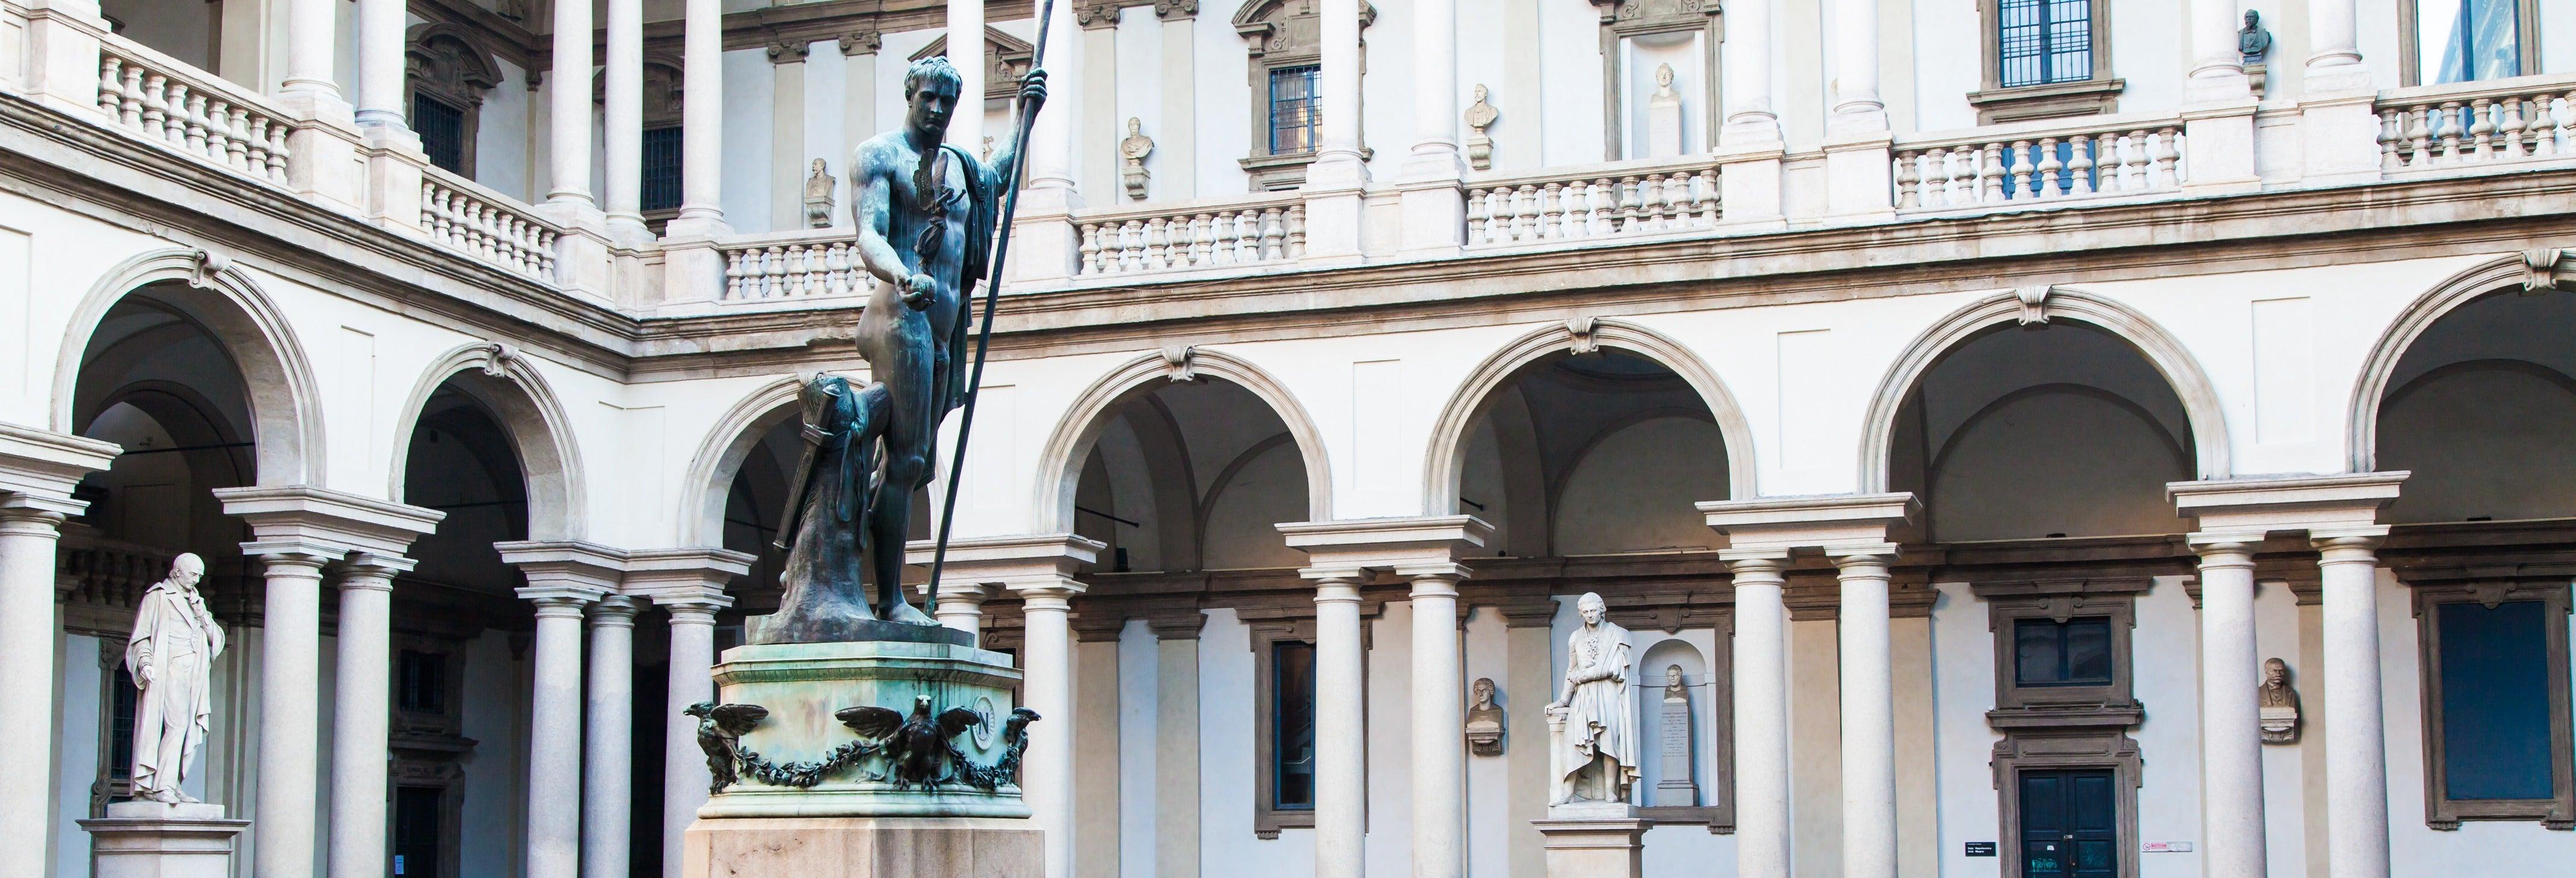 Free tour del arte por Milán